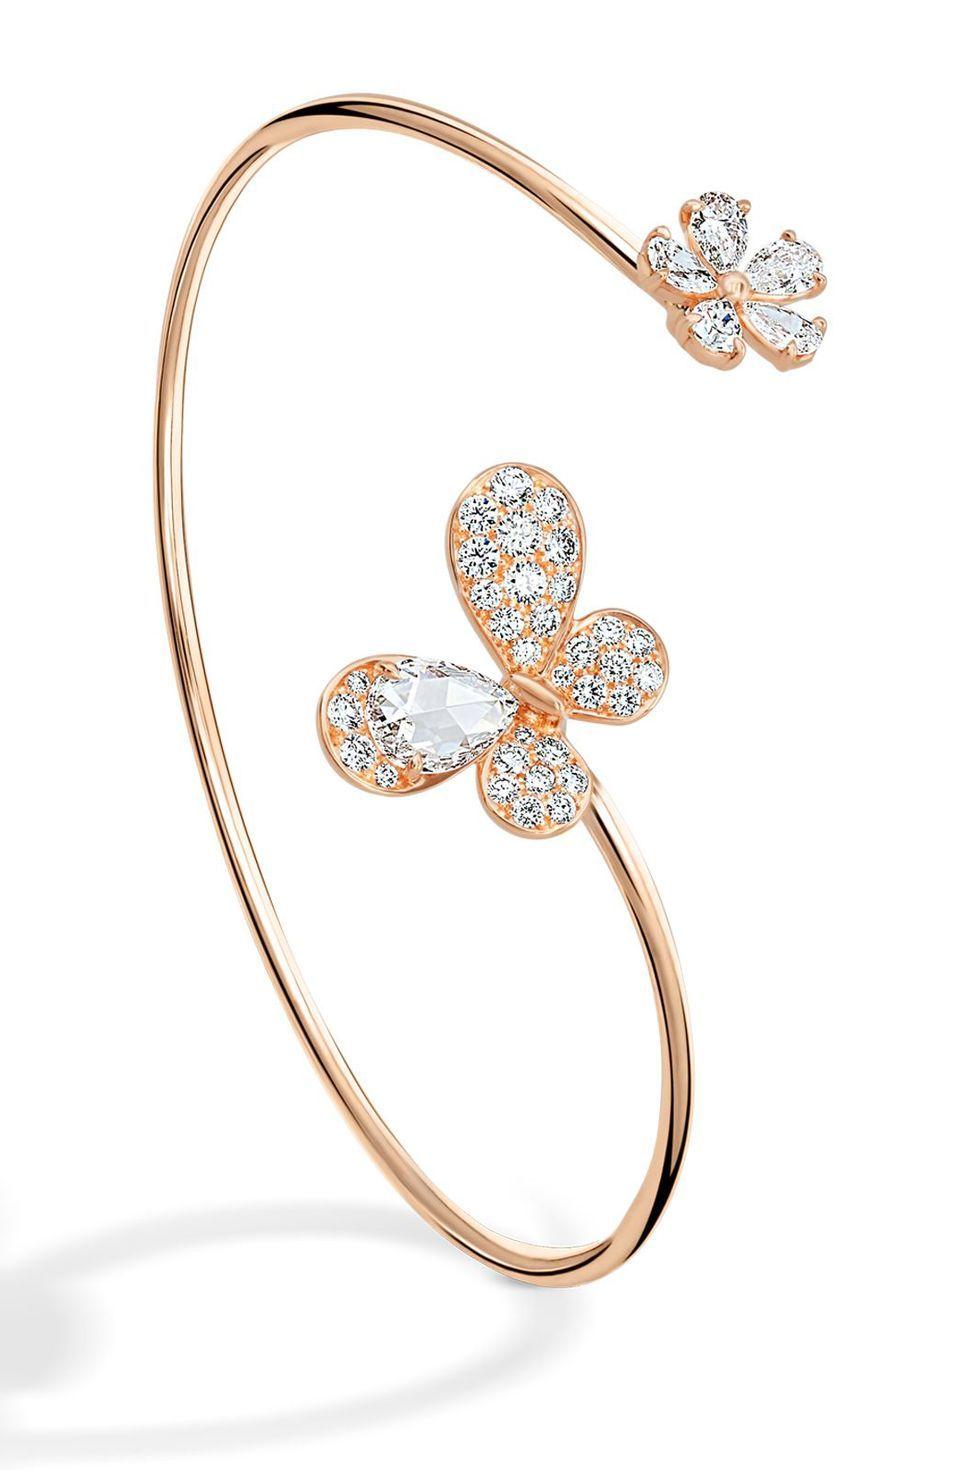 HOT Elegant Women/'s Crystal ROSE Flower Bangle Cuff Bracelet Jewelry Gold LOVE